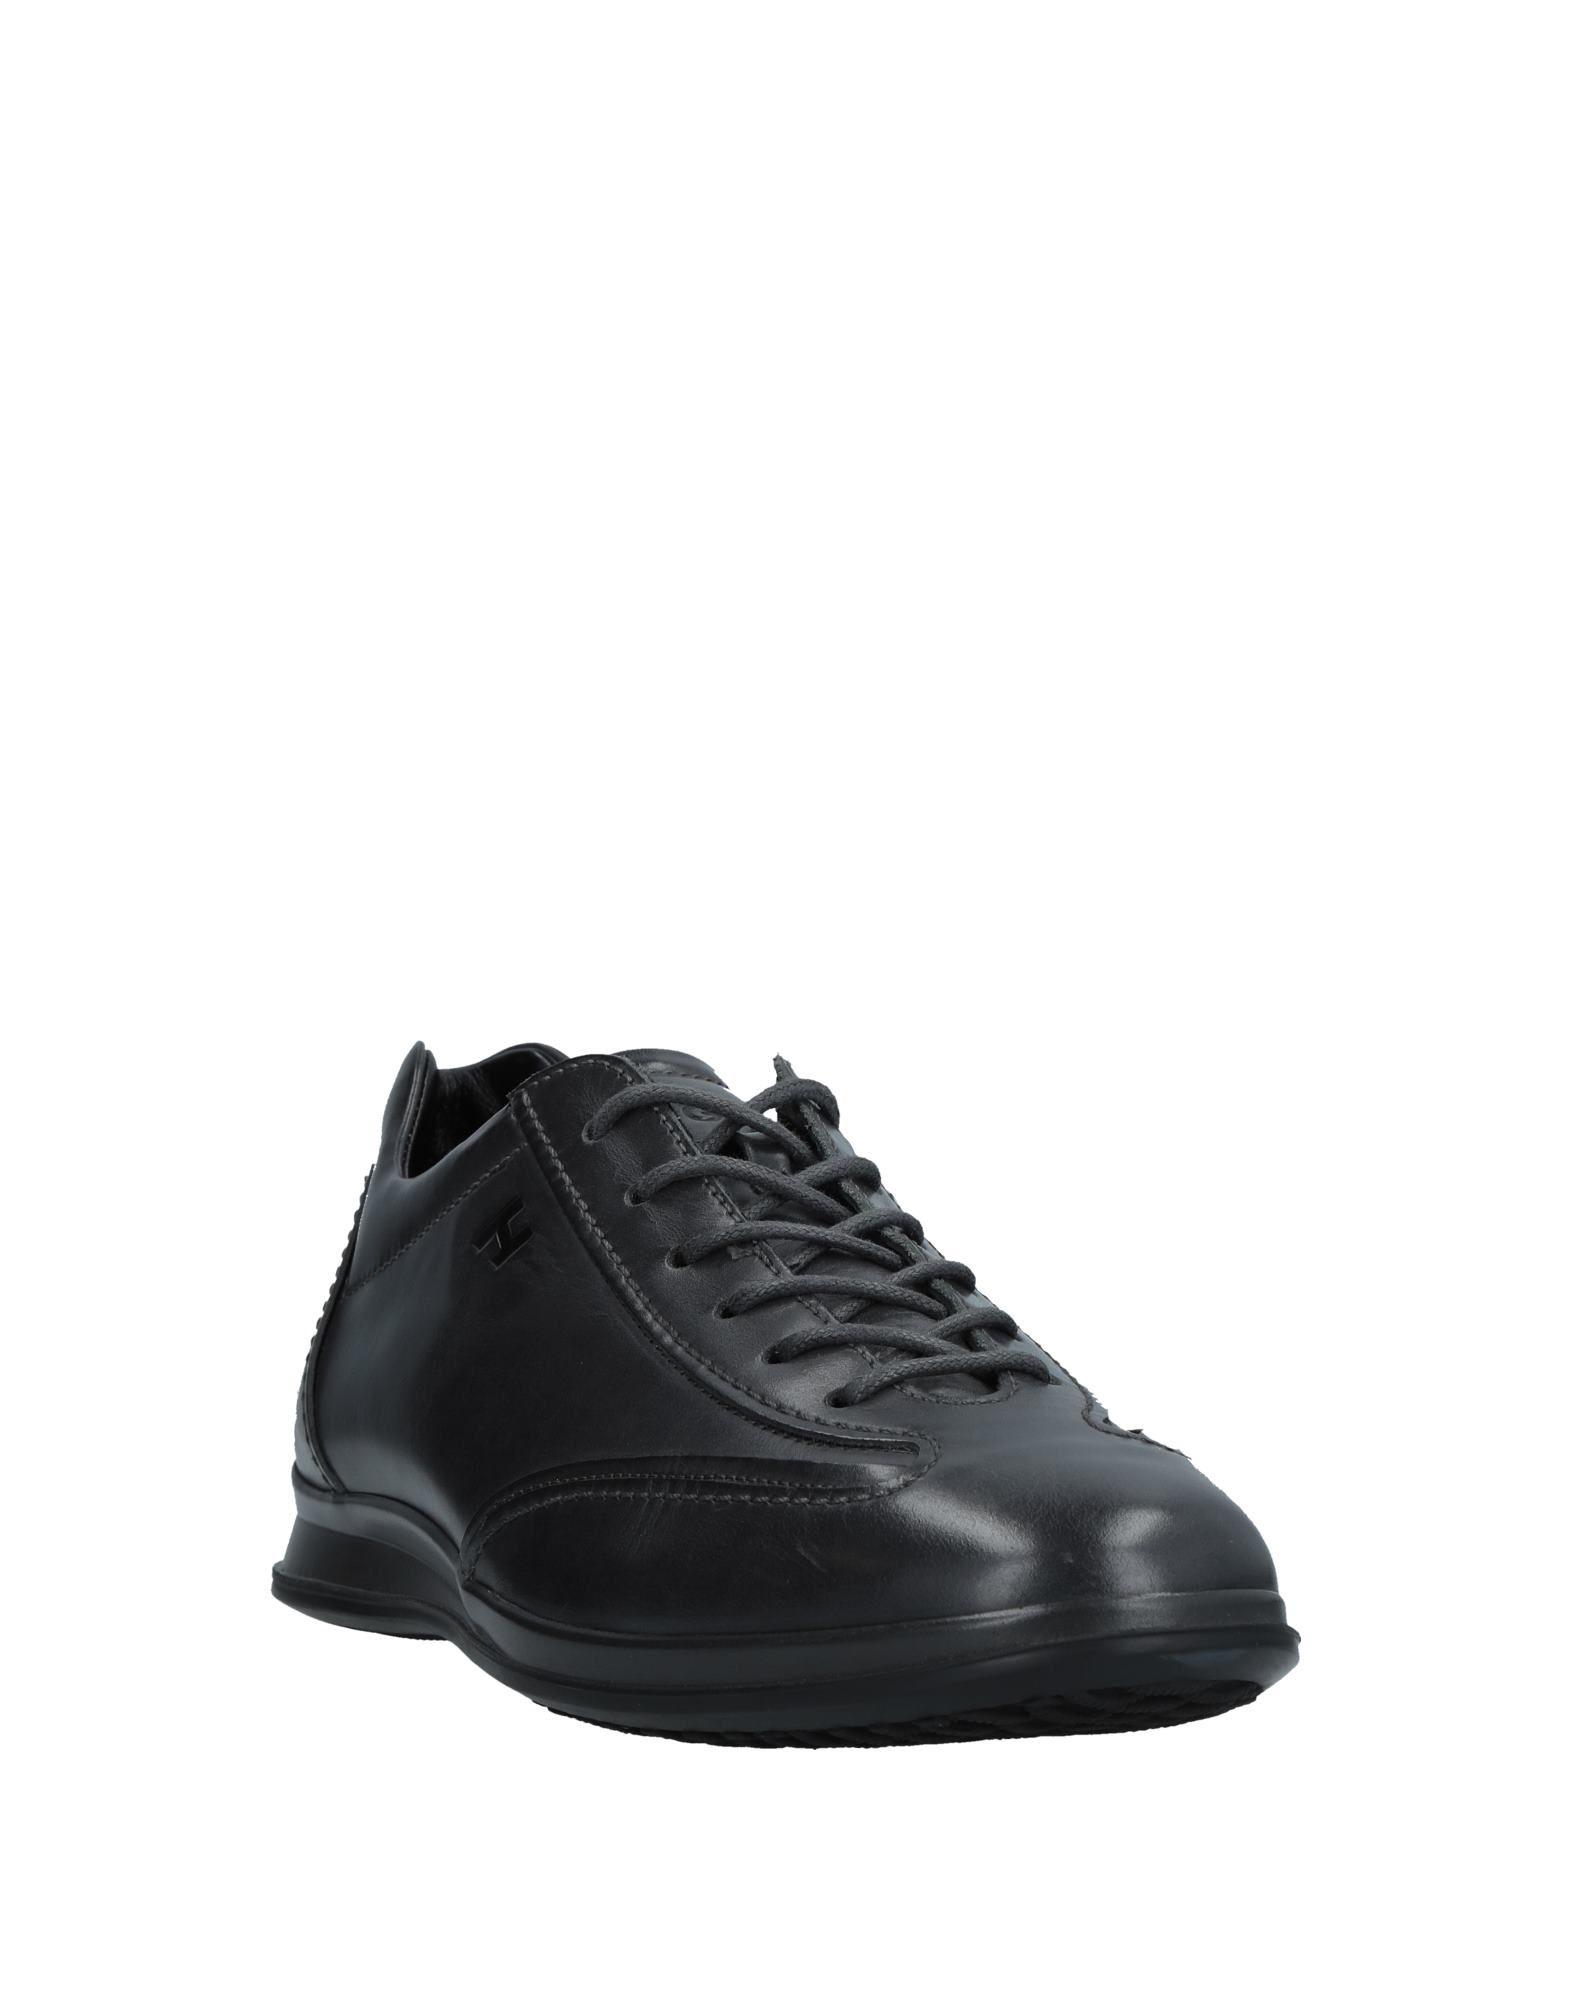 Hogan Sneakers Herren  11518543DK Gute Qualität beliebte Schuhe